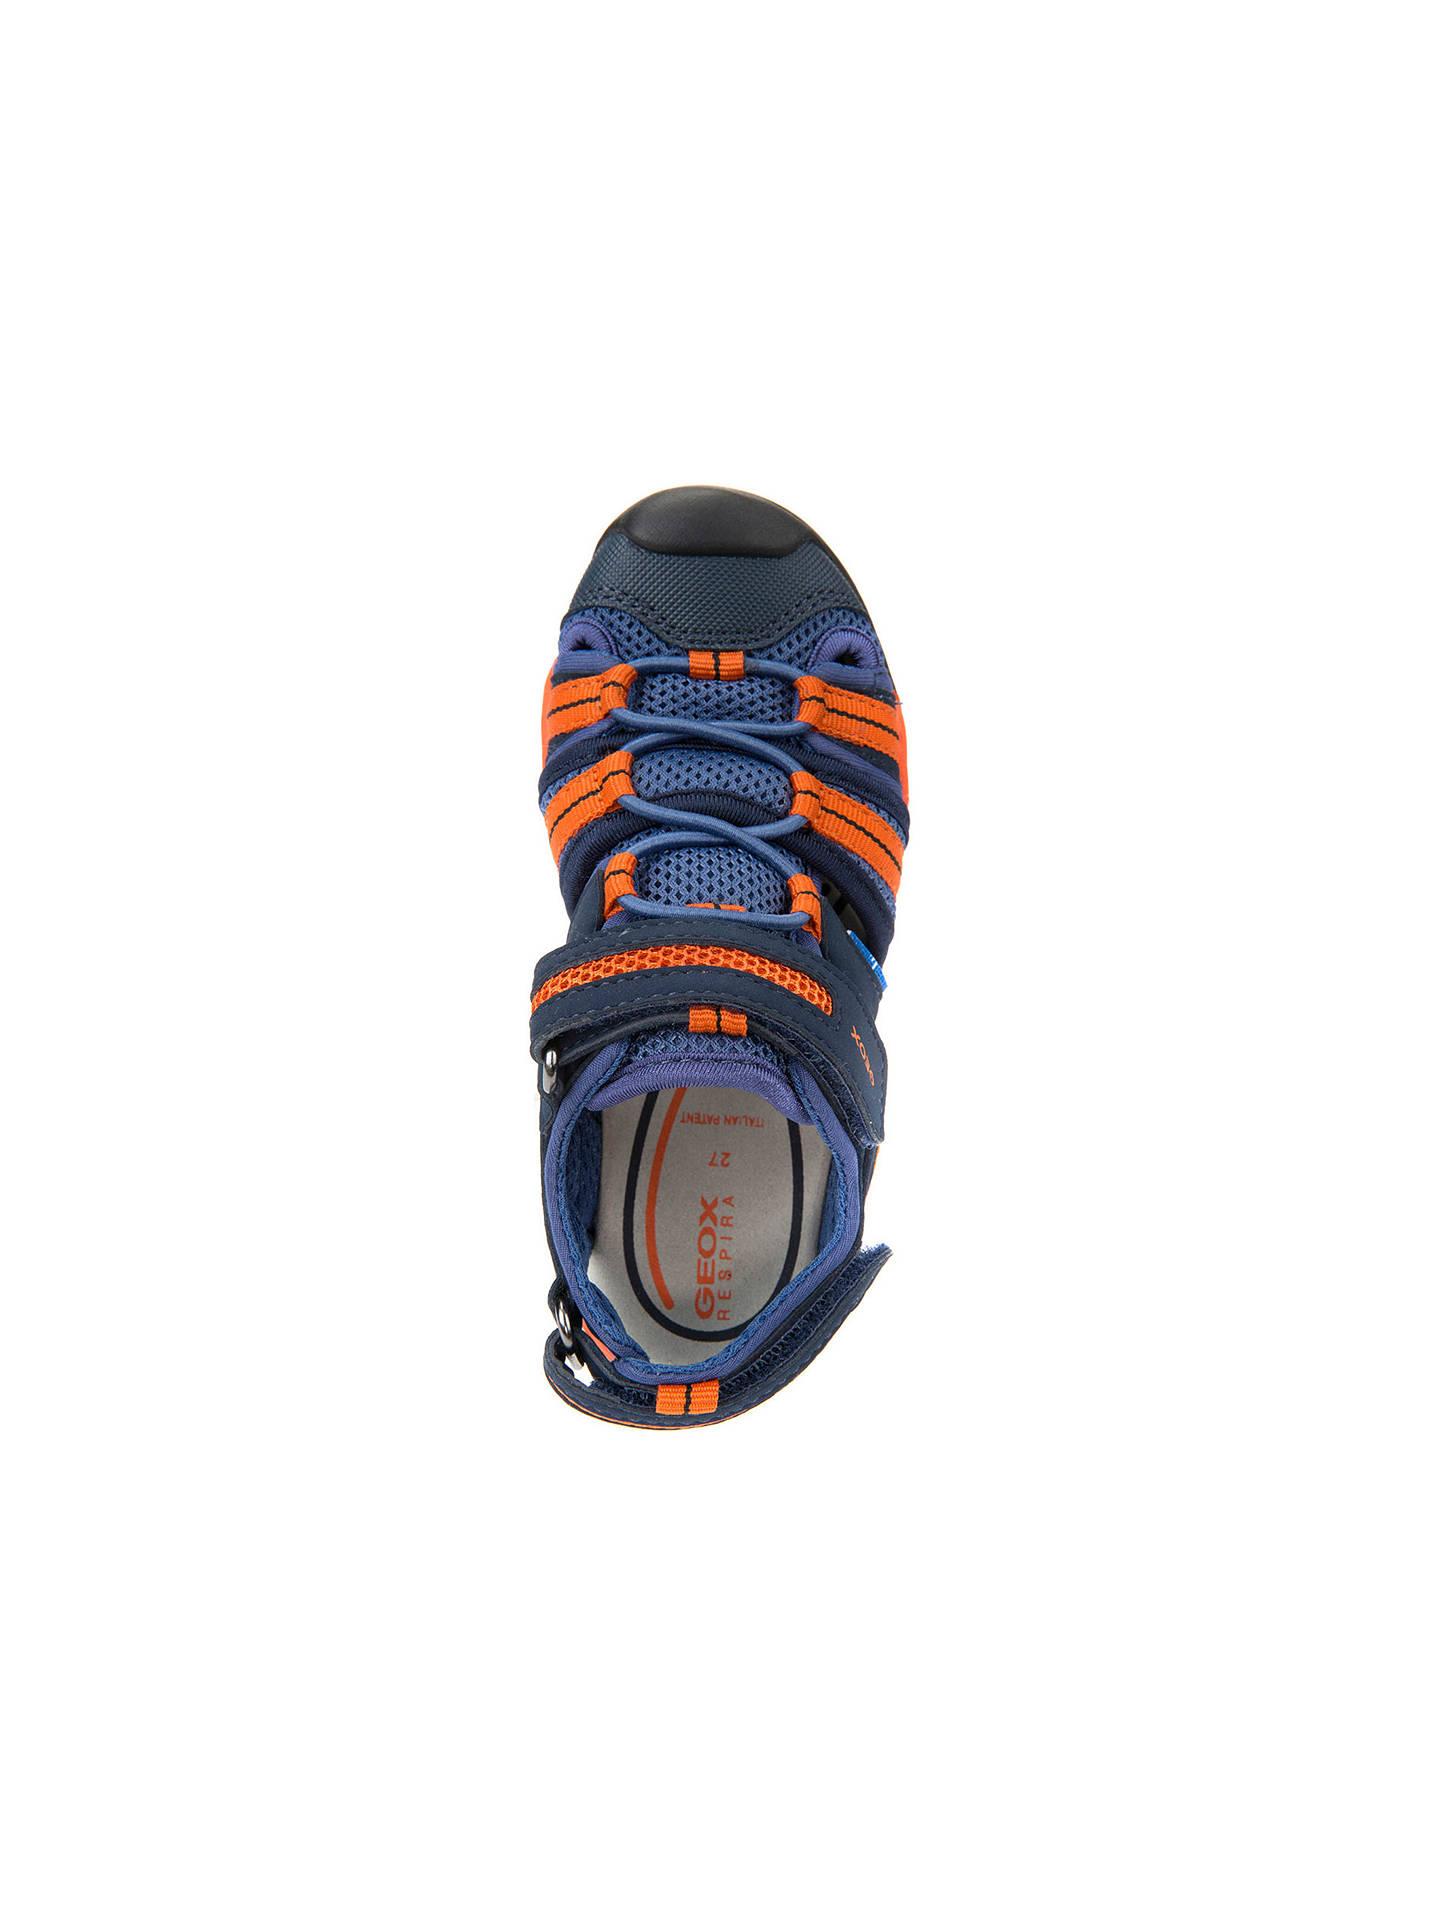 7f3d73fe1a925 Buy Geox Children's J Borealis Sandals, Navy/Orange, 26 Online at johnlewis.